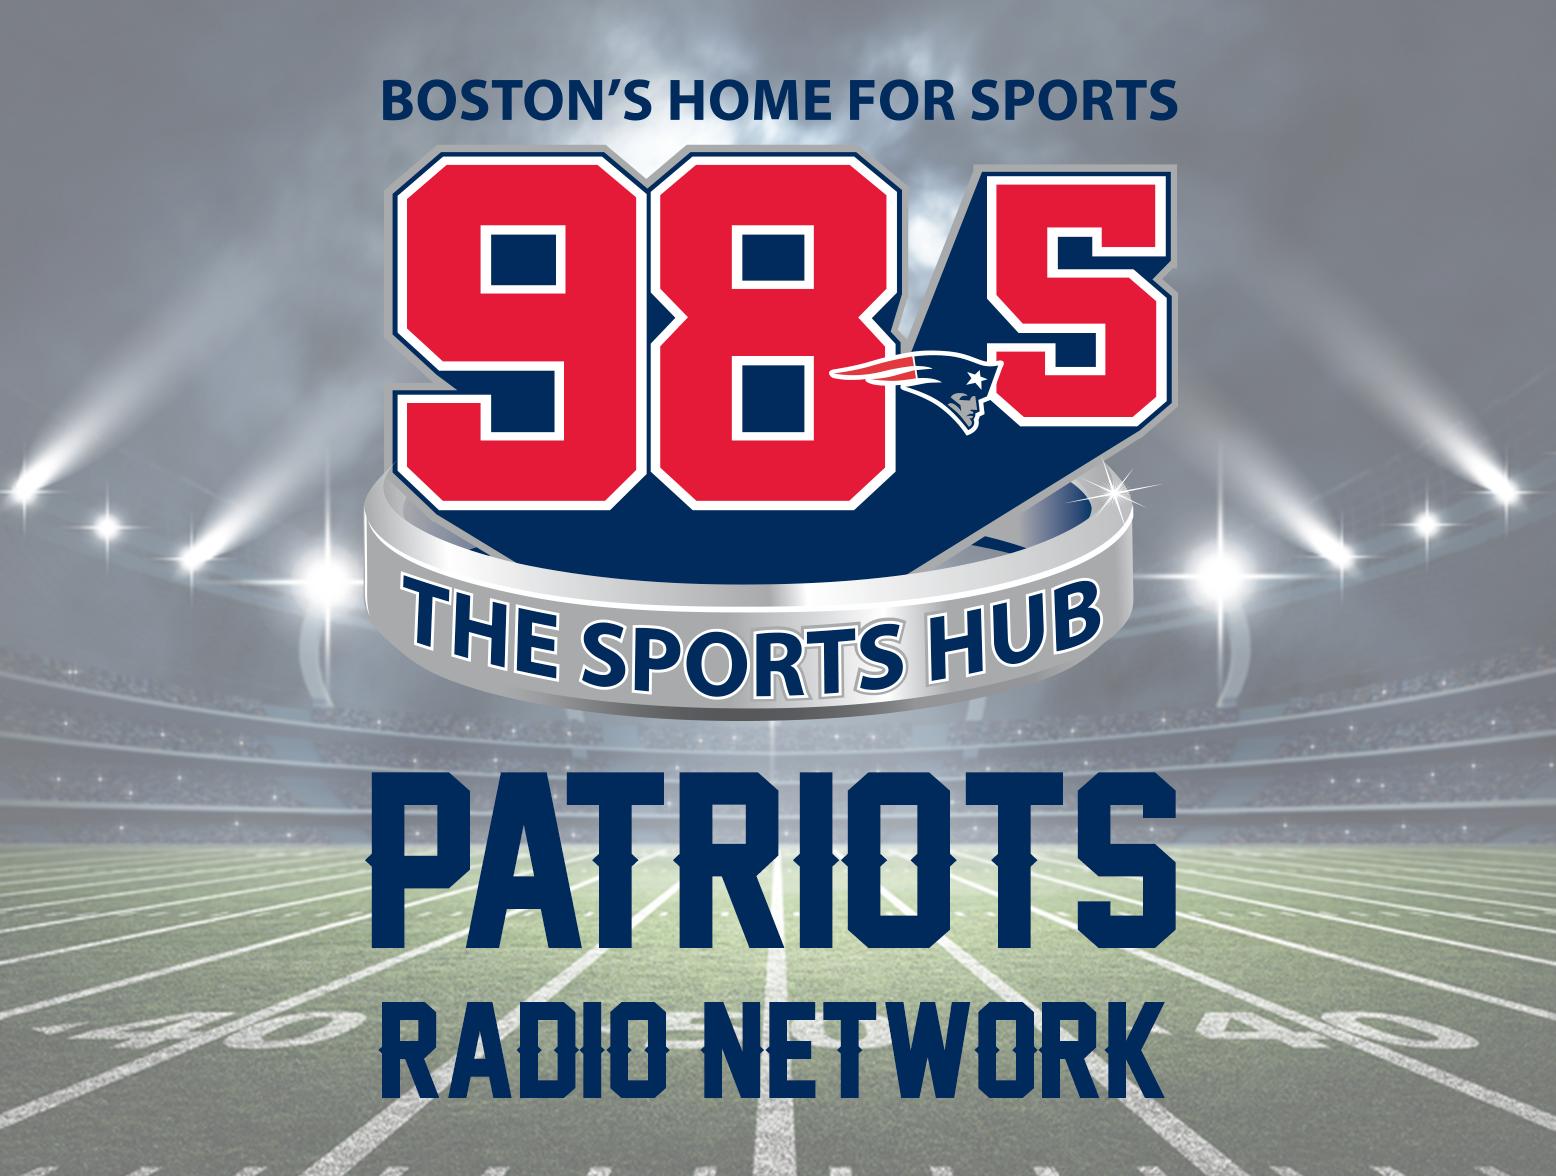 Patriots Radio Network